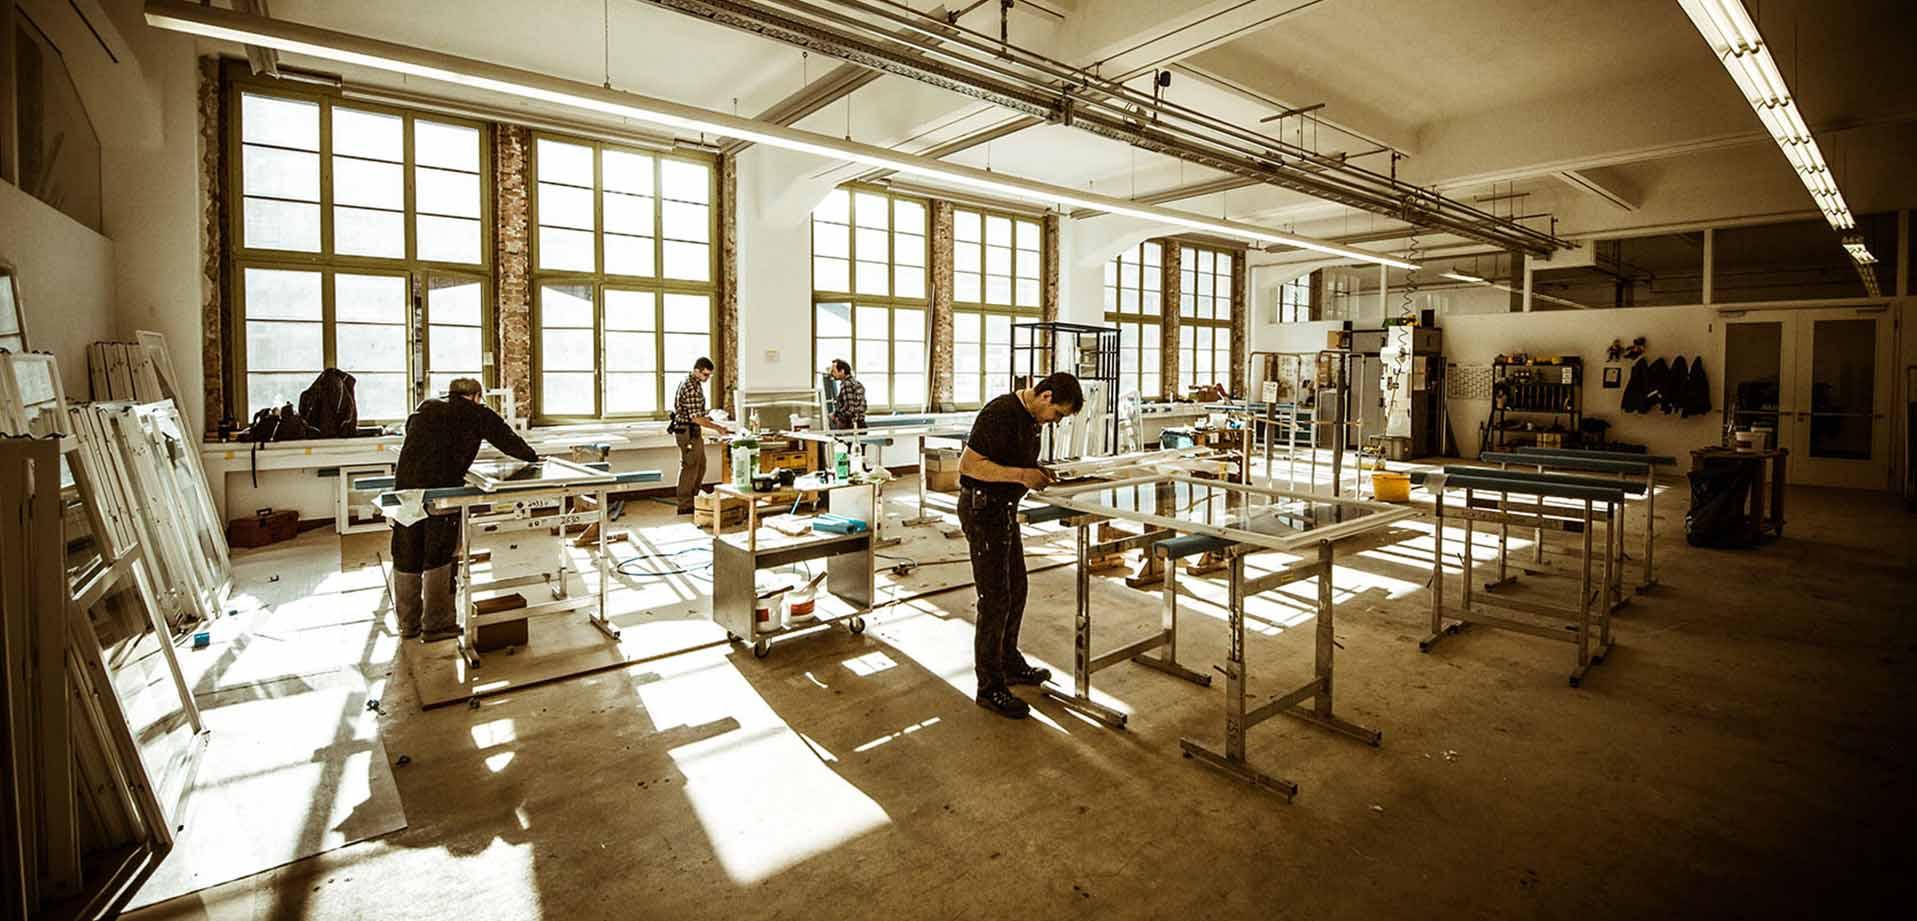 Holzmanufaktur München holzmanufaktur rottweil startseite